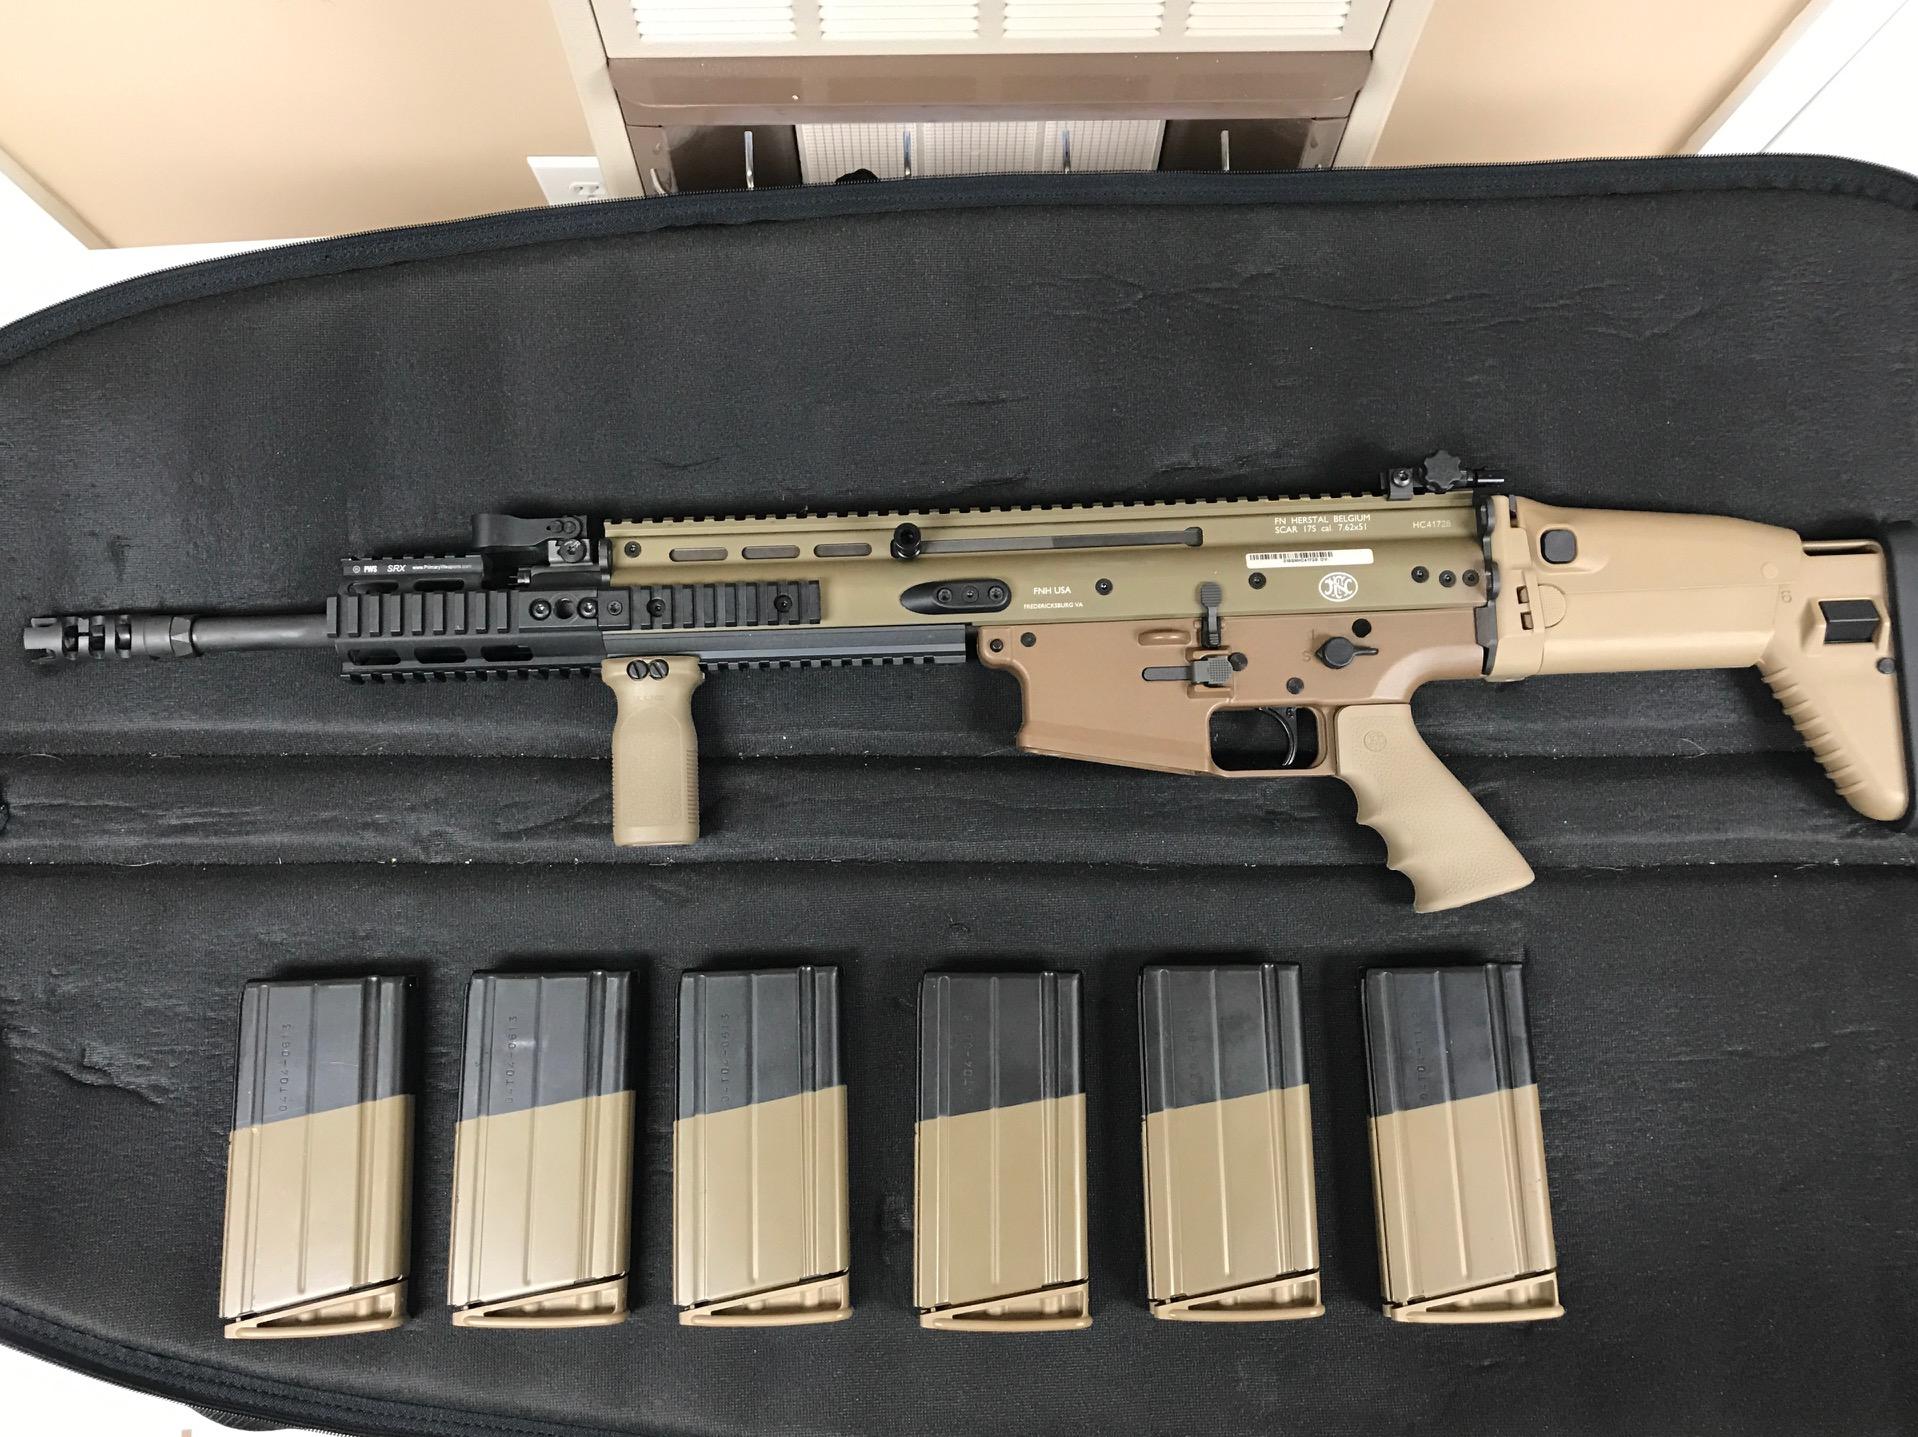 FN SCAR 17s w/ Upgrades - Geissele, Rail Extension (Auction